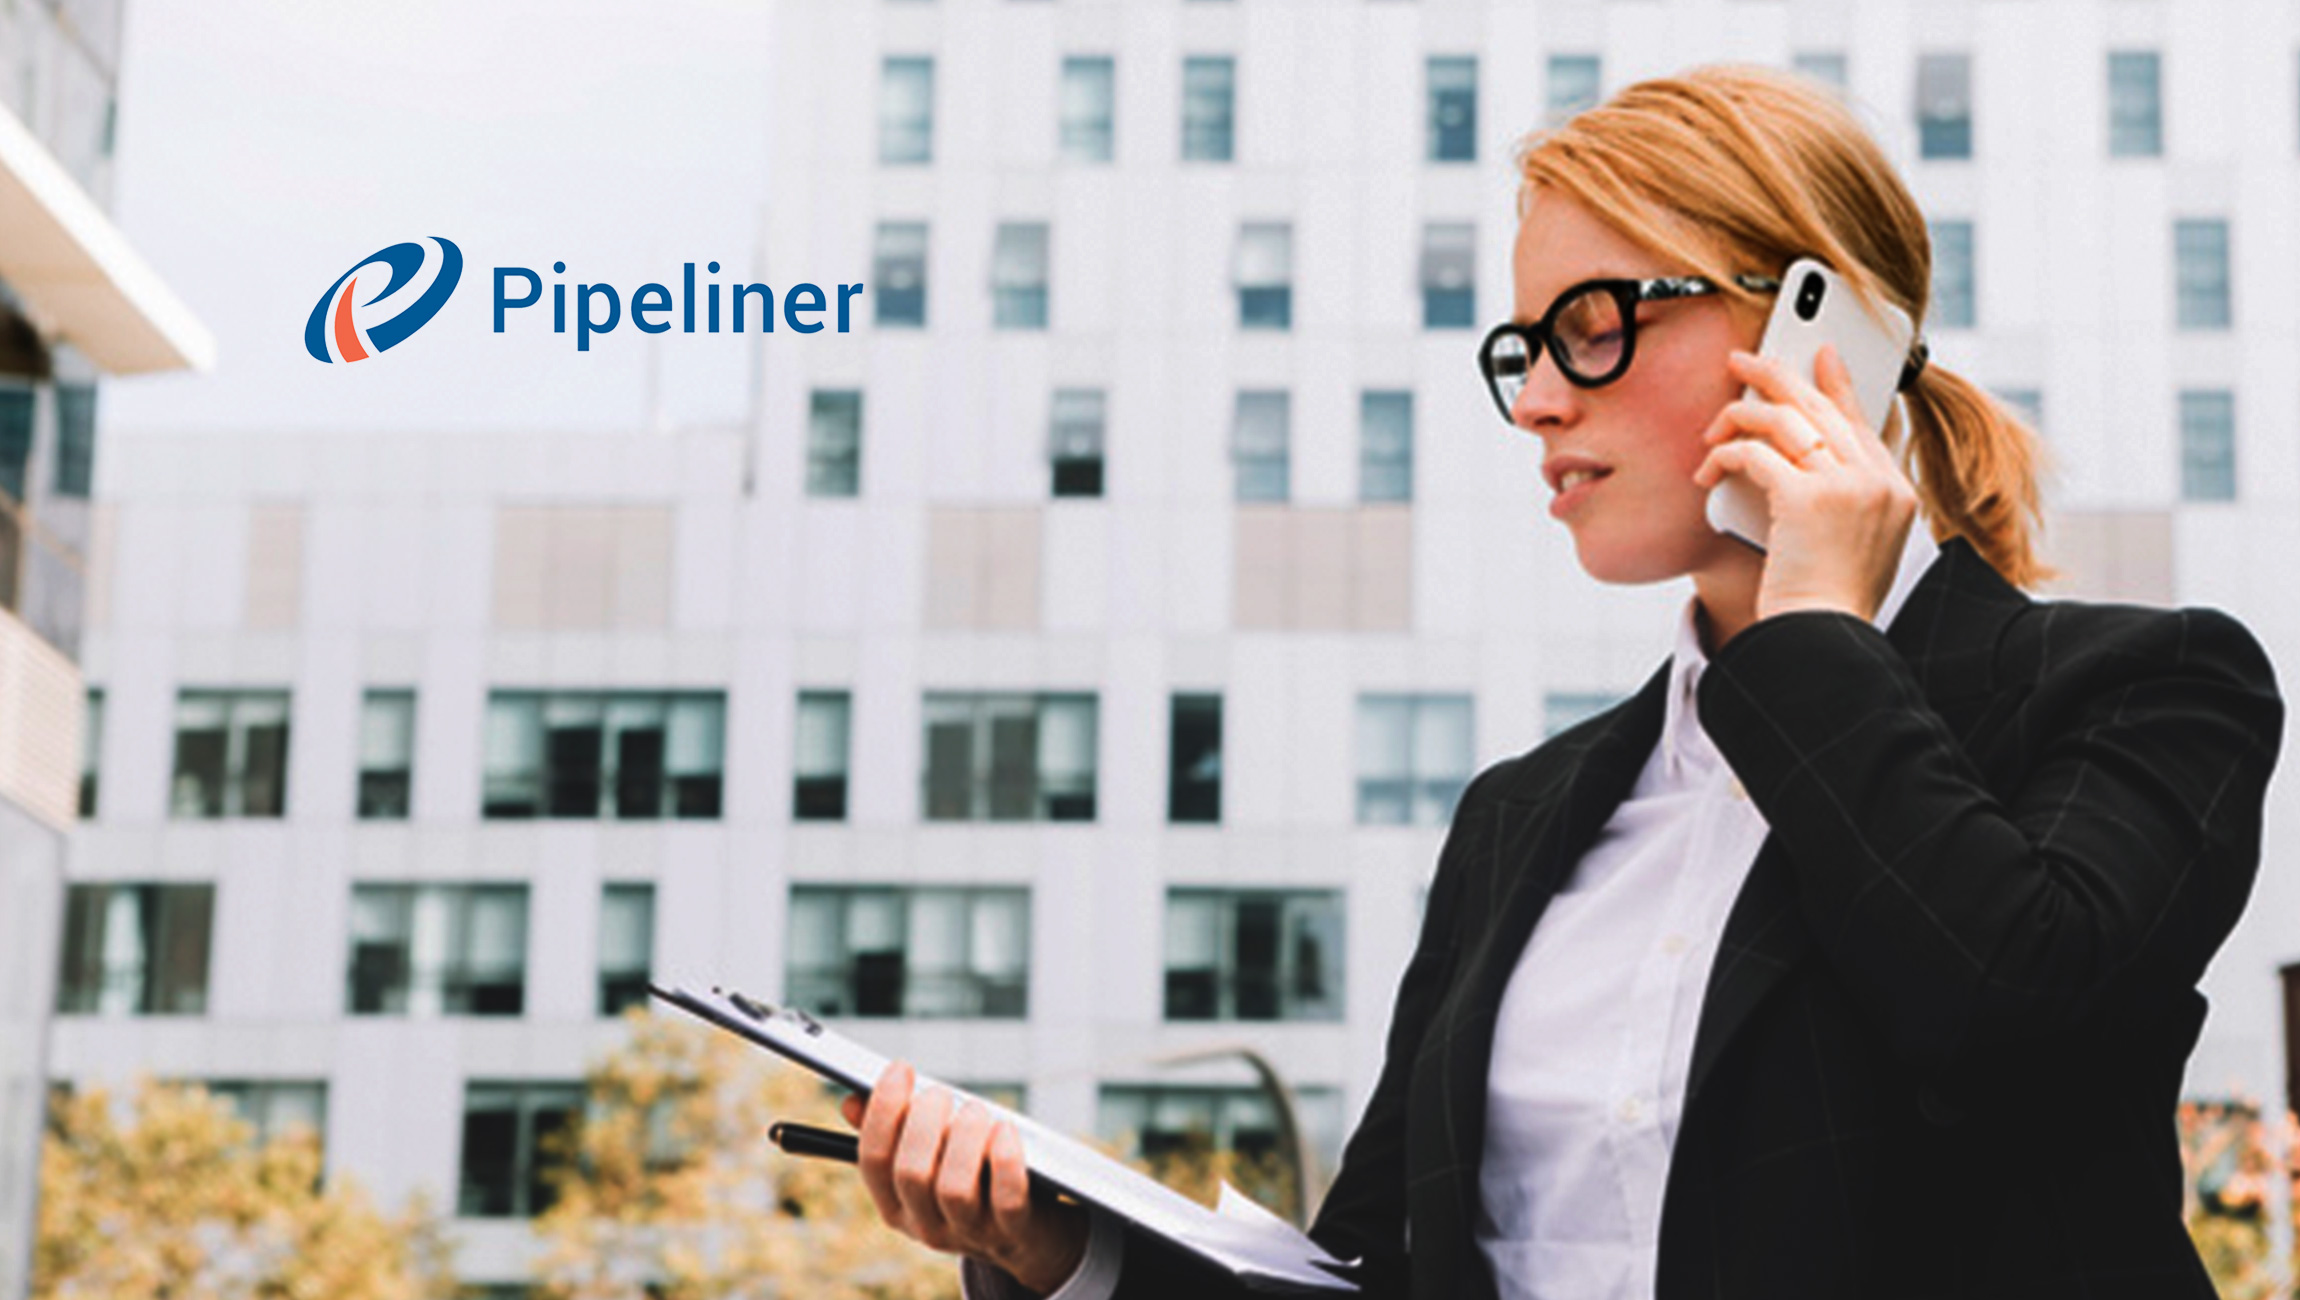 Pipeliner Appoints Don Araldi EVP of Sales